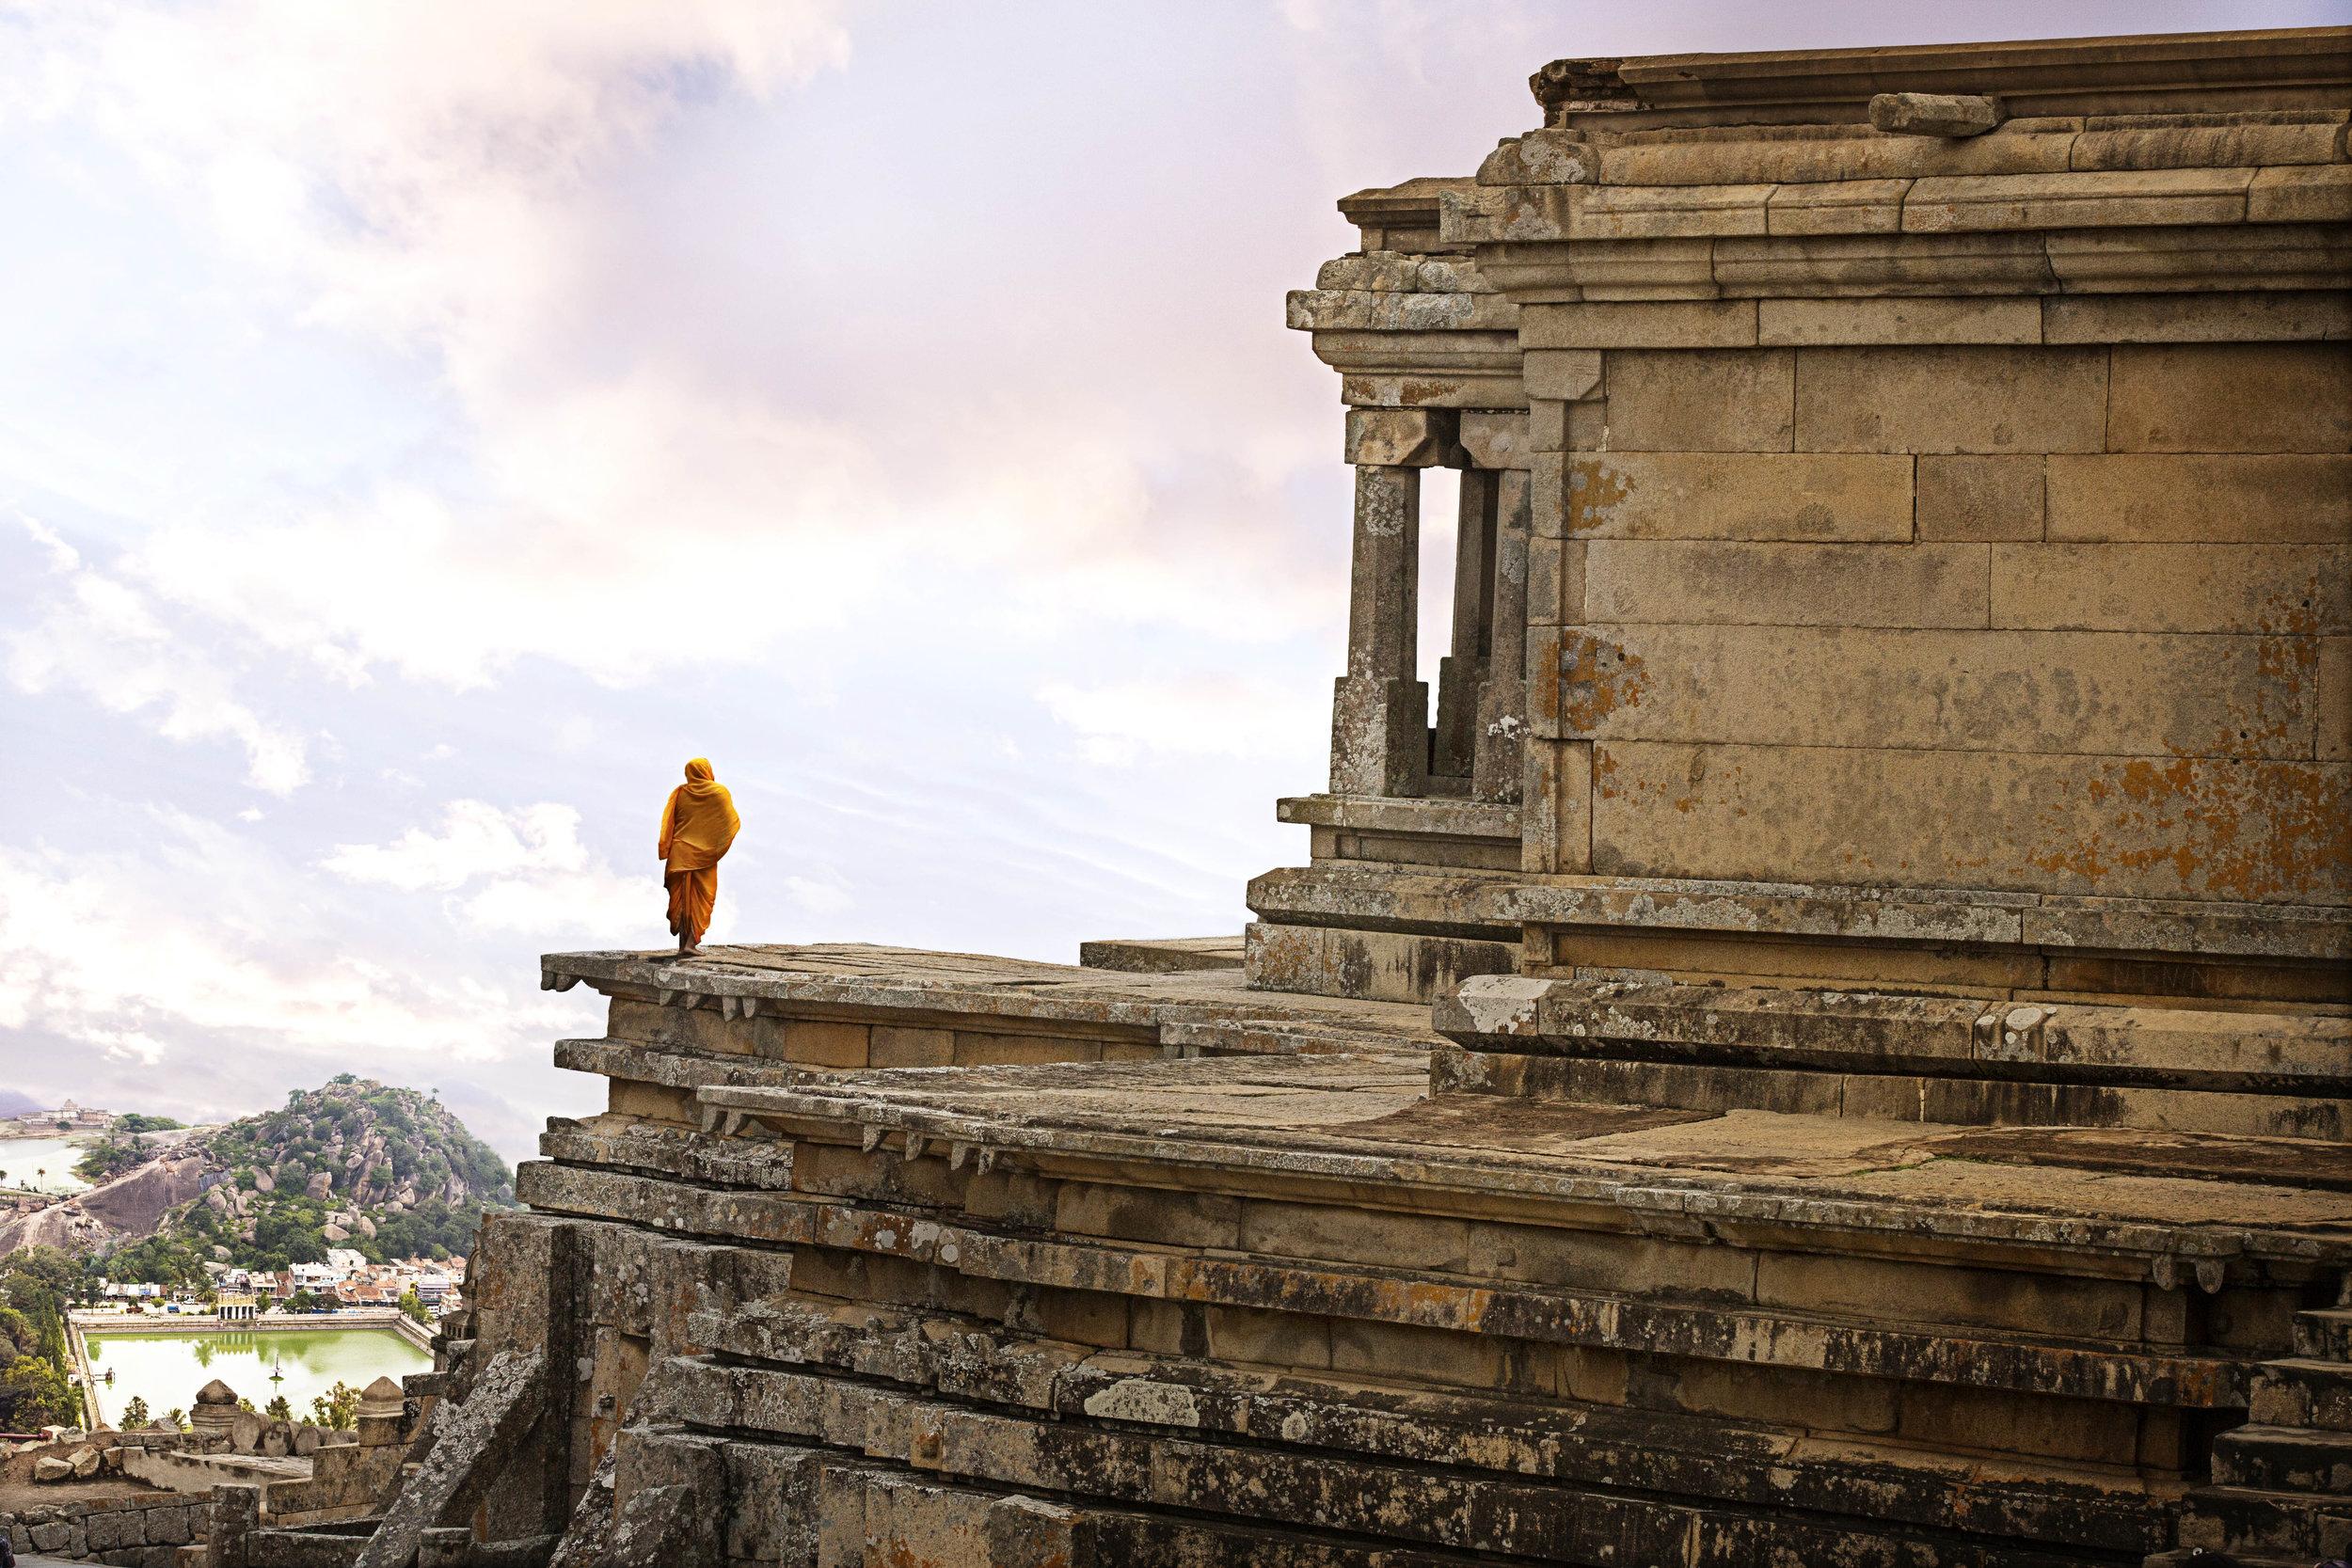 India_temple-v2.jpg